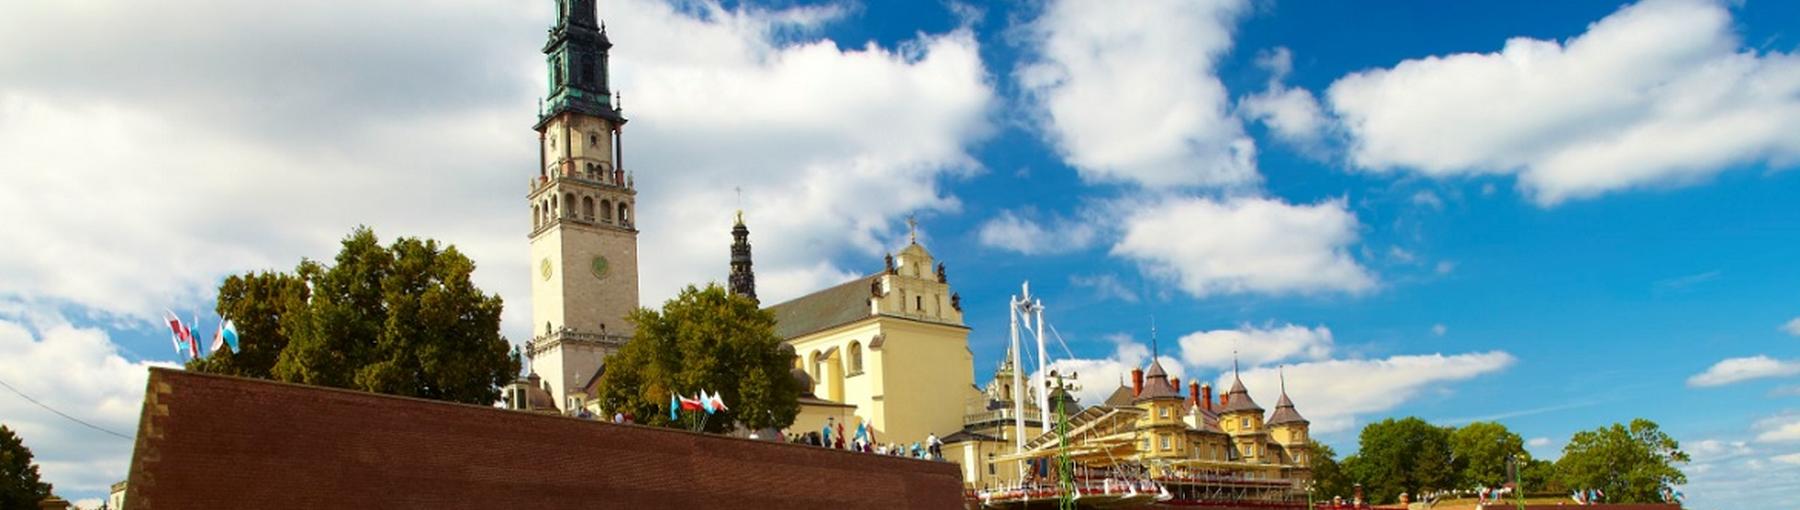 Jasna Gora Foto: Polen.travel